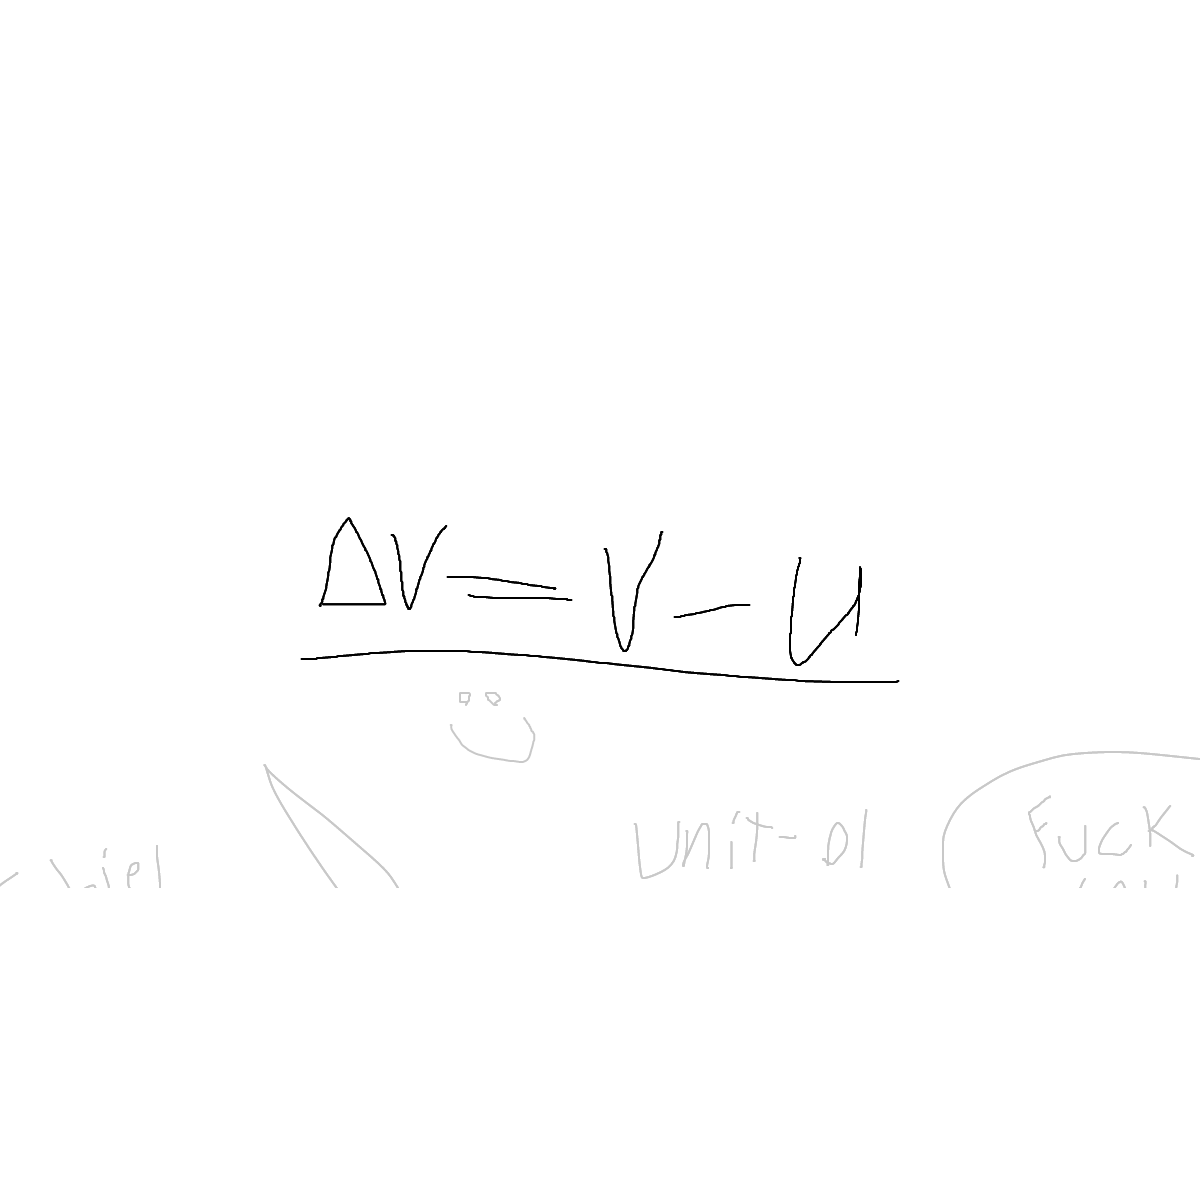 BAAAM drawing#8282 lat:35.1811828613281250lng: 139.0301055908203000